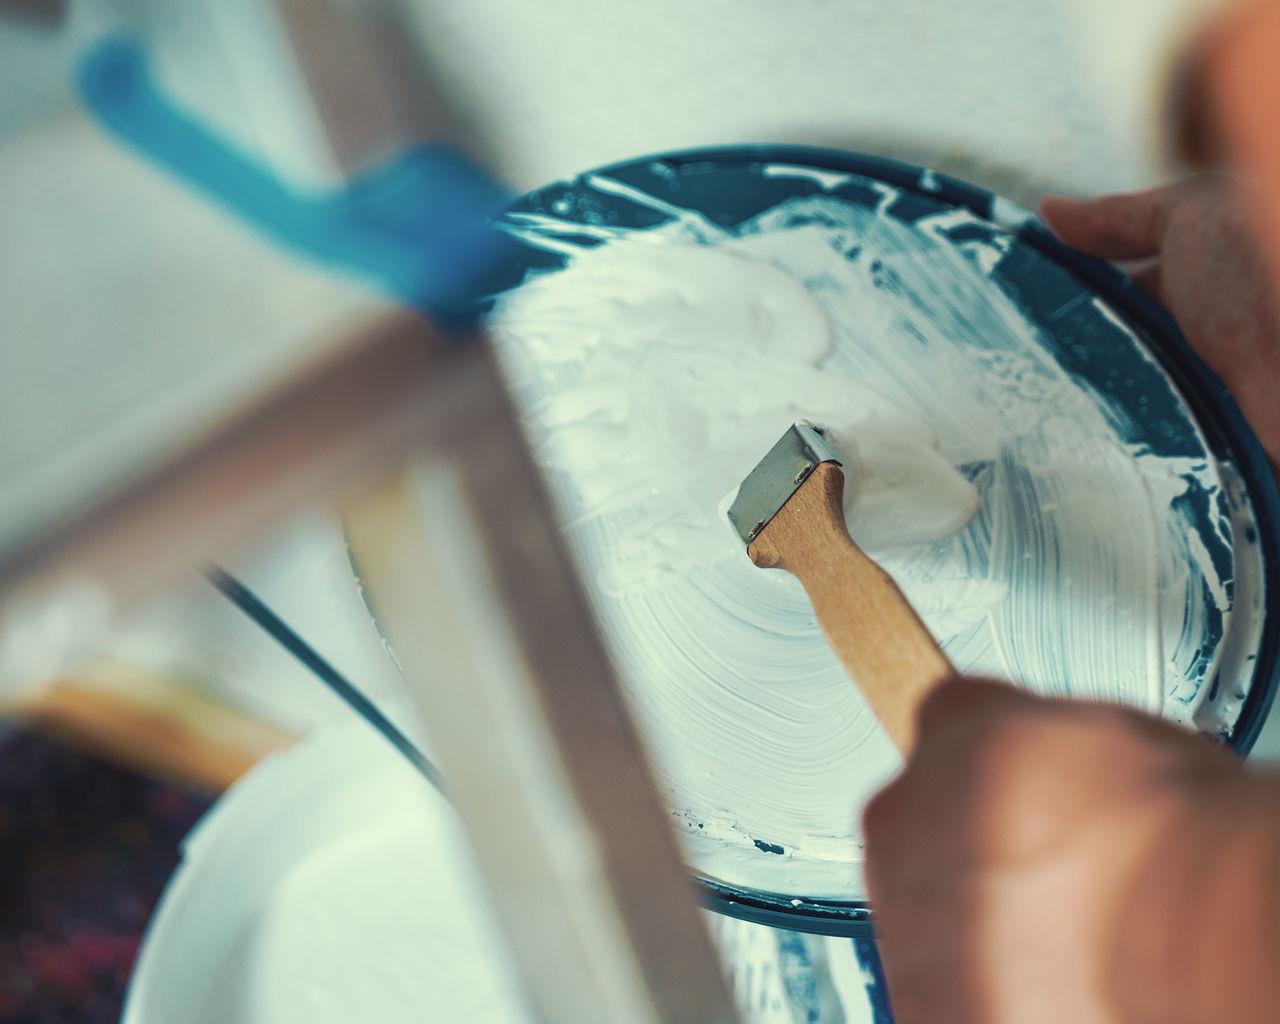 Brush Color DIY Home Housepainting Paint Paintbrush Painter Painting Refurbish Renovate Renovation White Working Working Hard